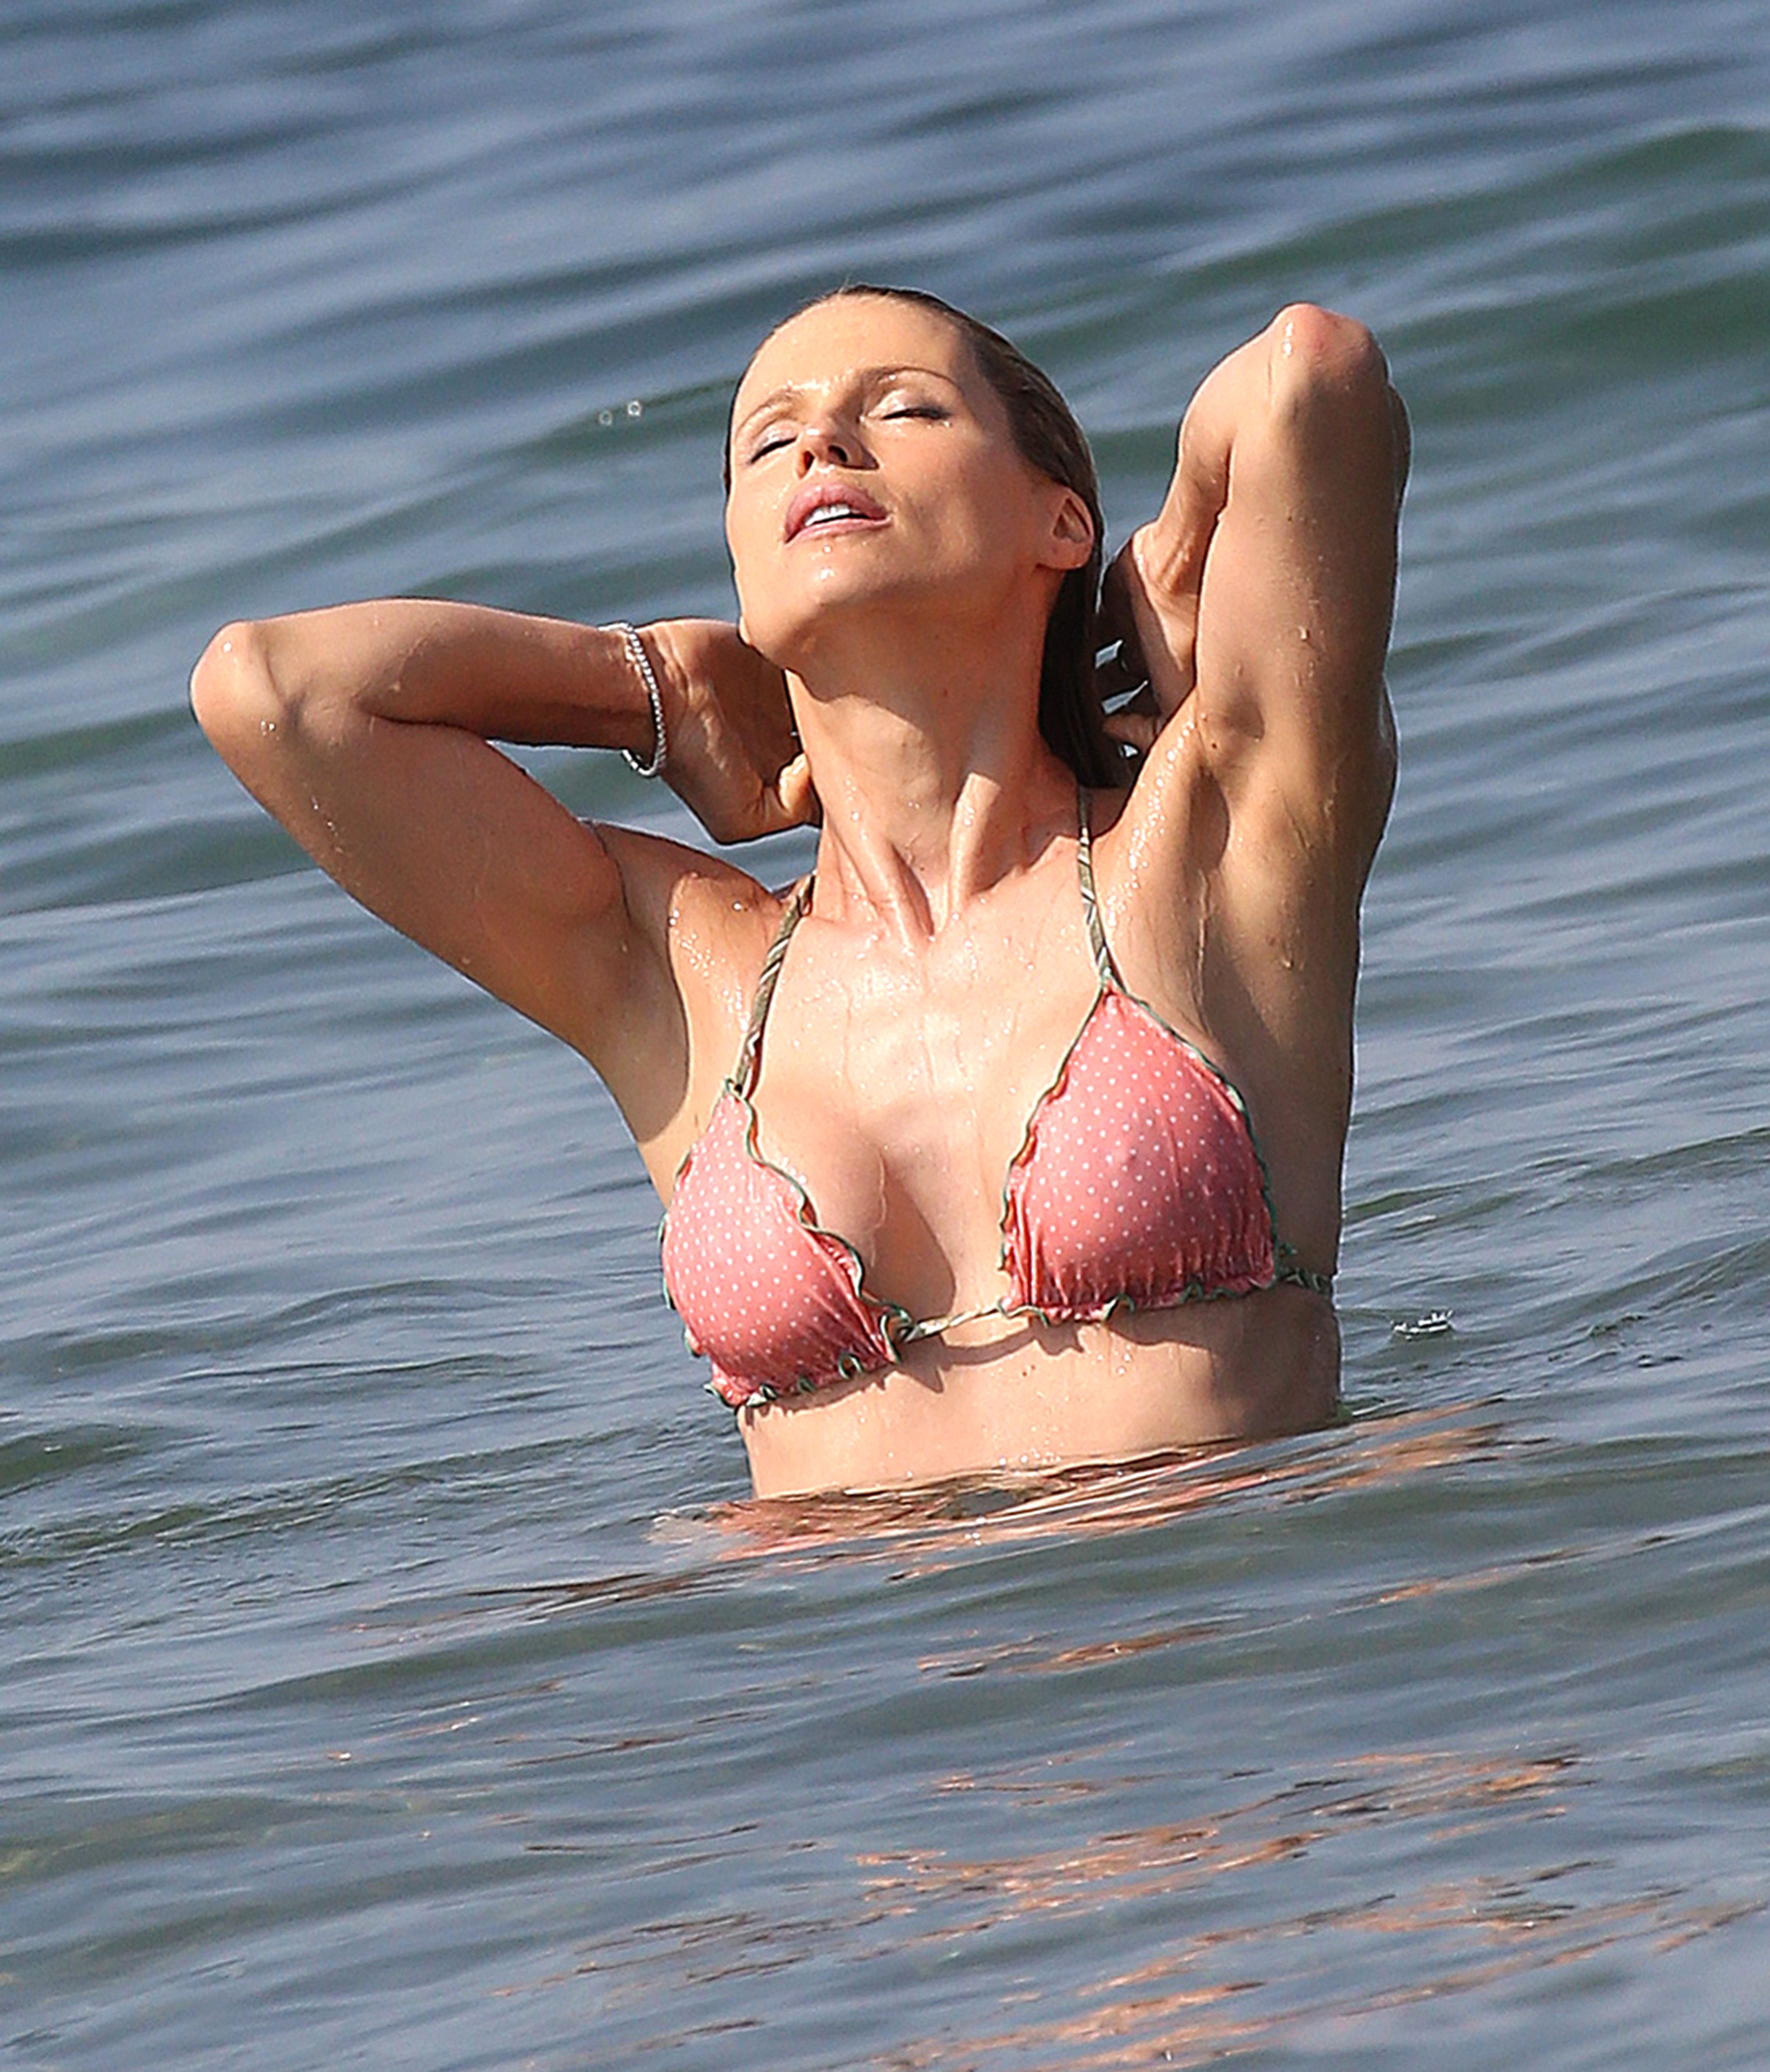 Michelle-Hunziker-in-a-Bikini-6